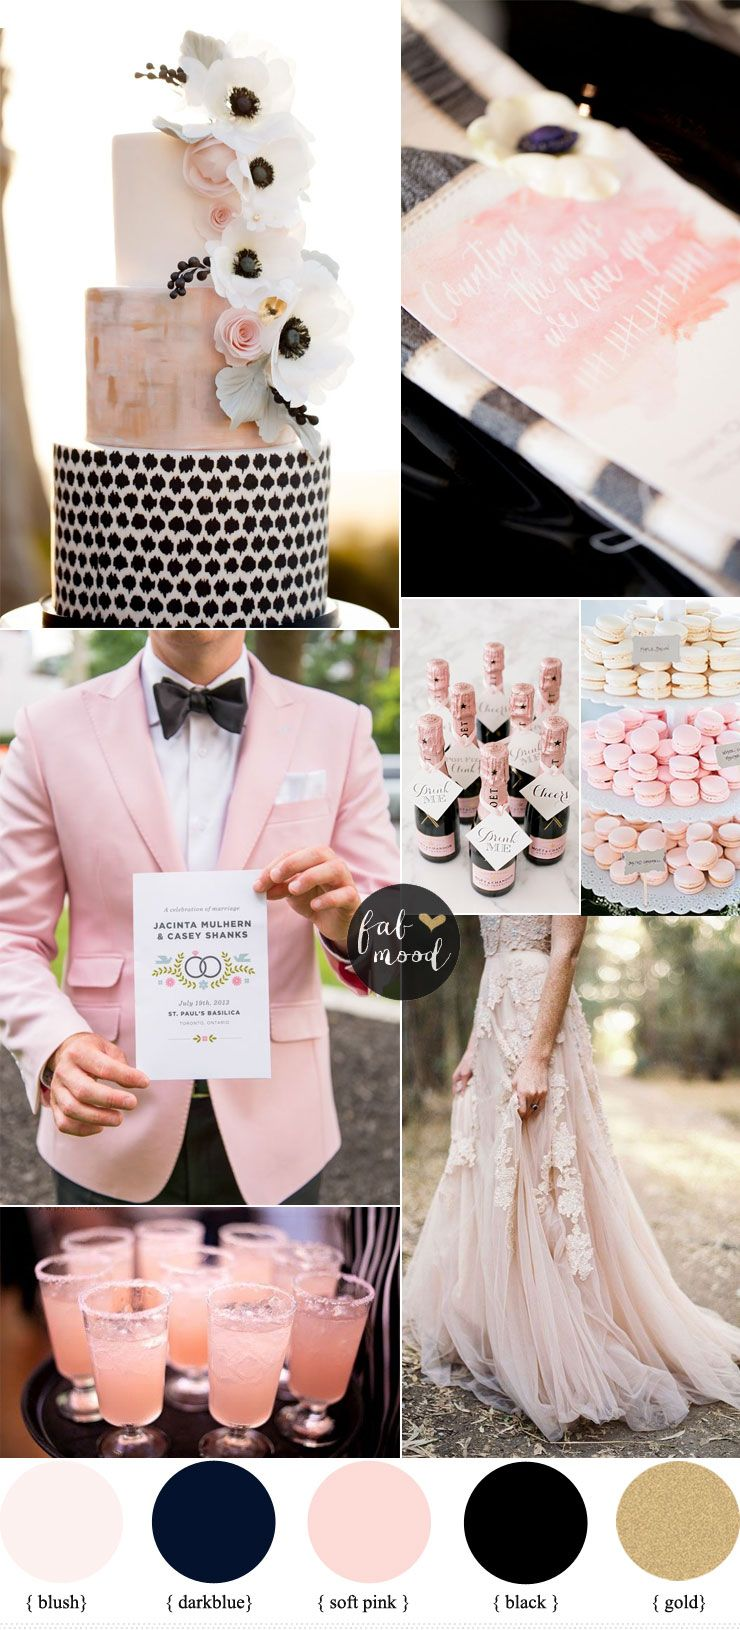 Black on black wedding decor  Black and Blush Pink Wedding  Romantic Wedding Color Scheme